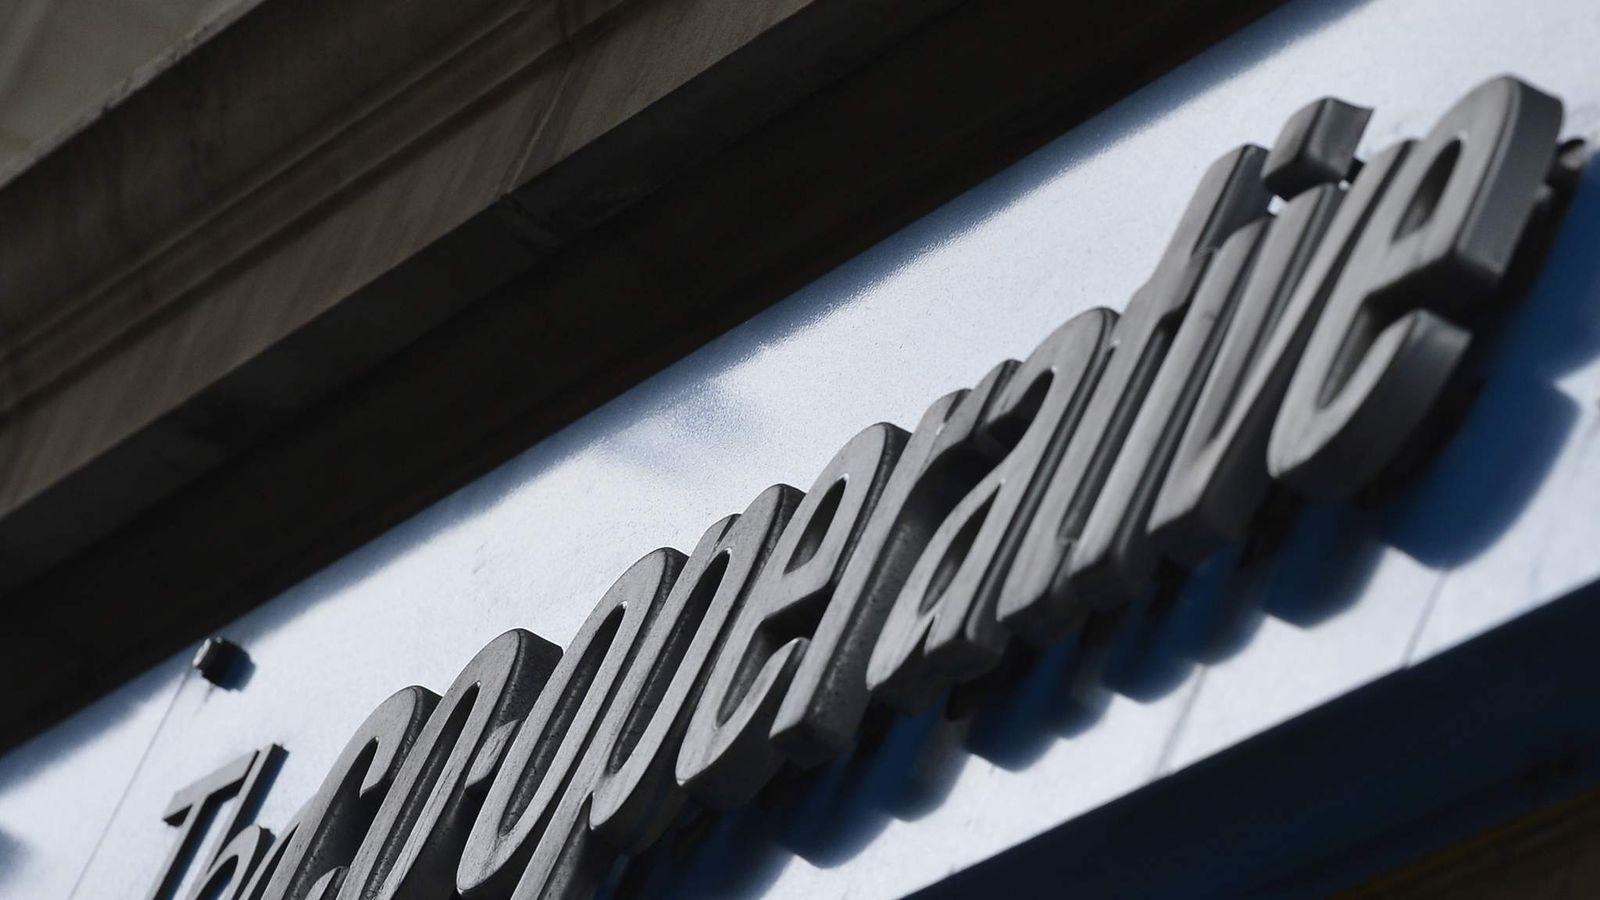 Co-op Group plans £300m insurance sale - LoveWorld TV